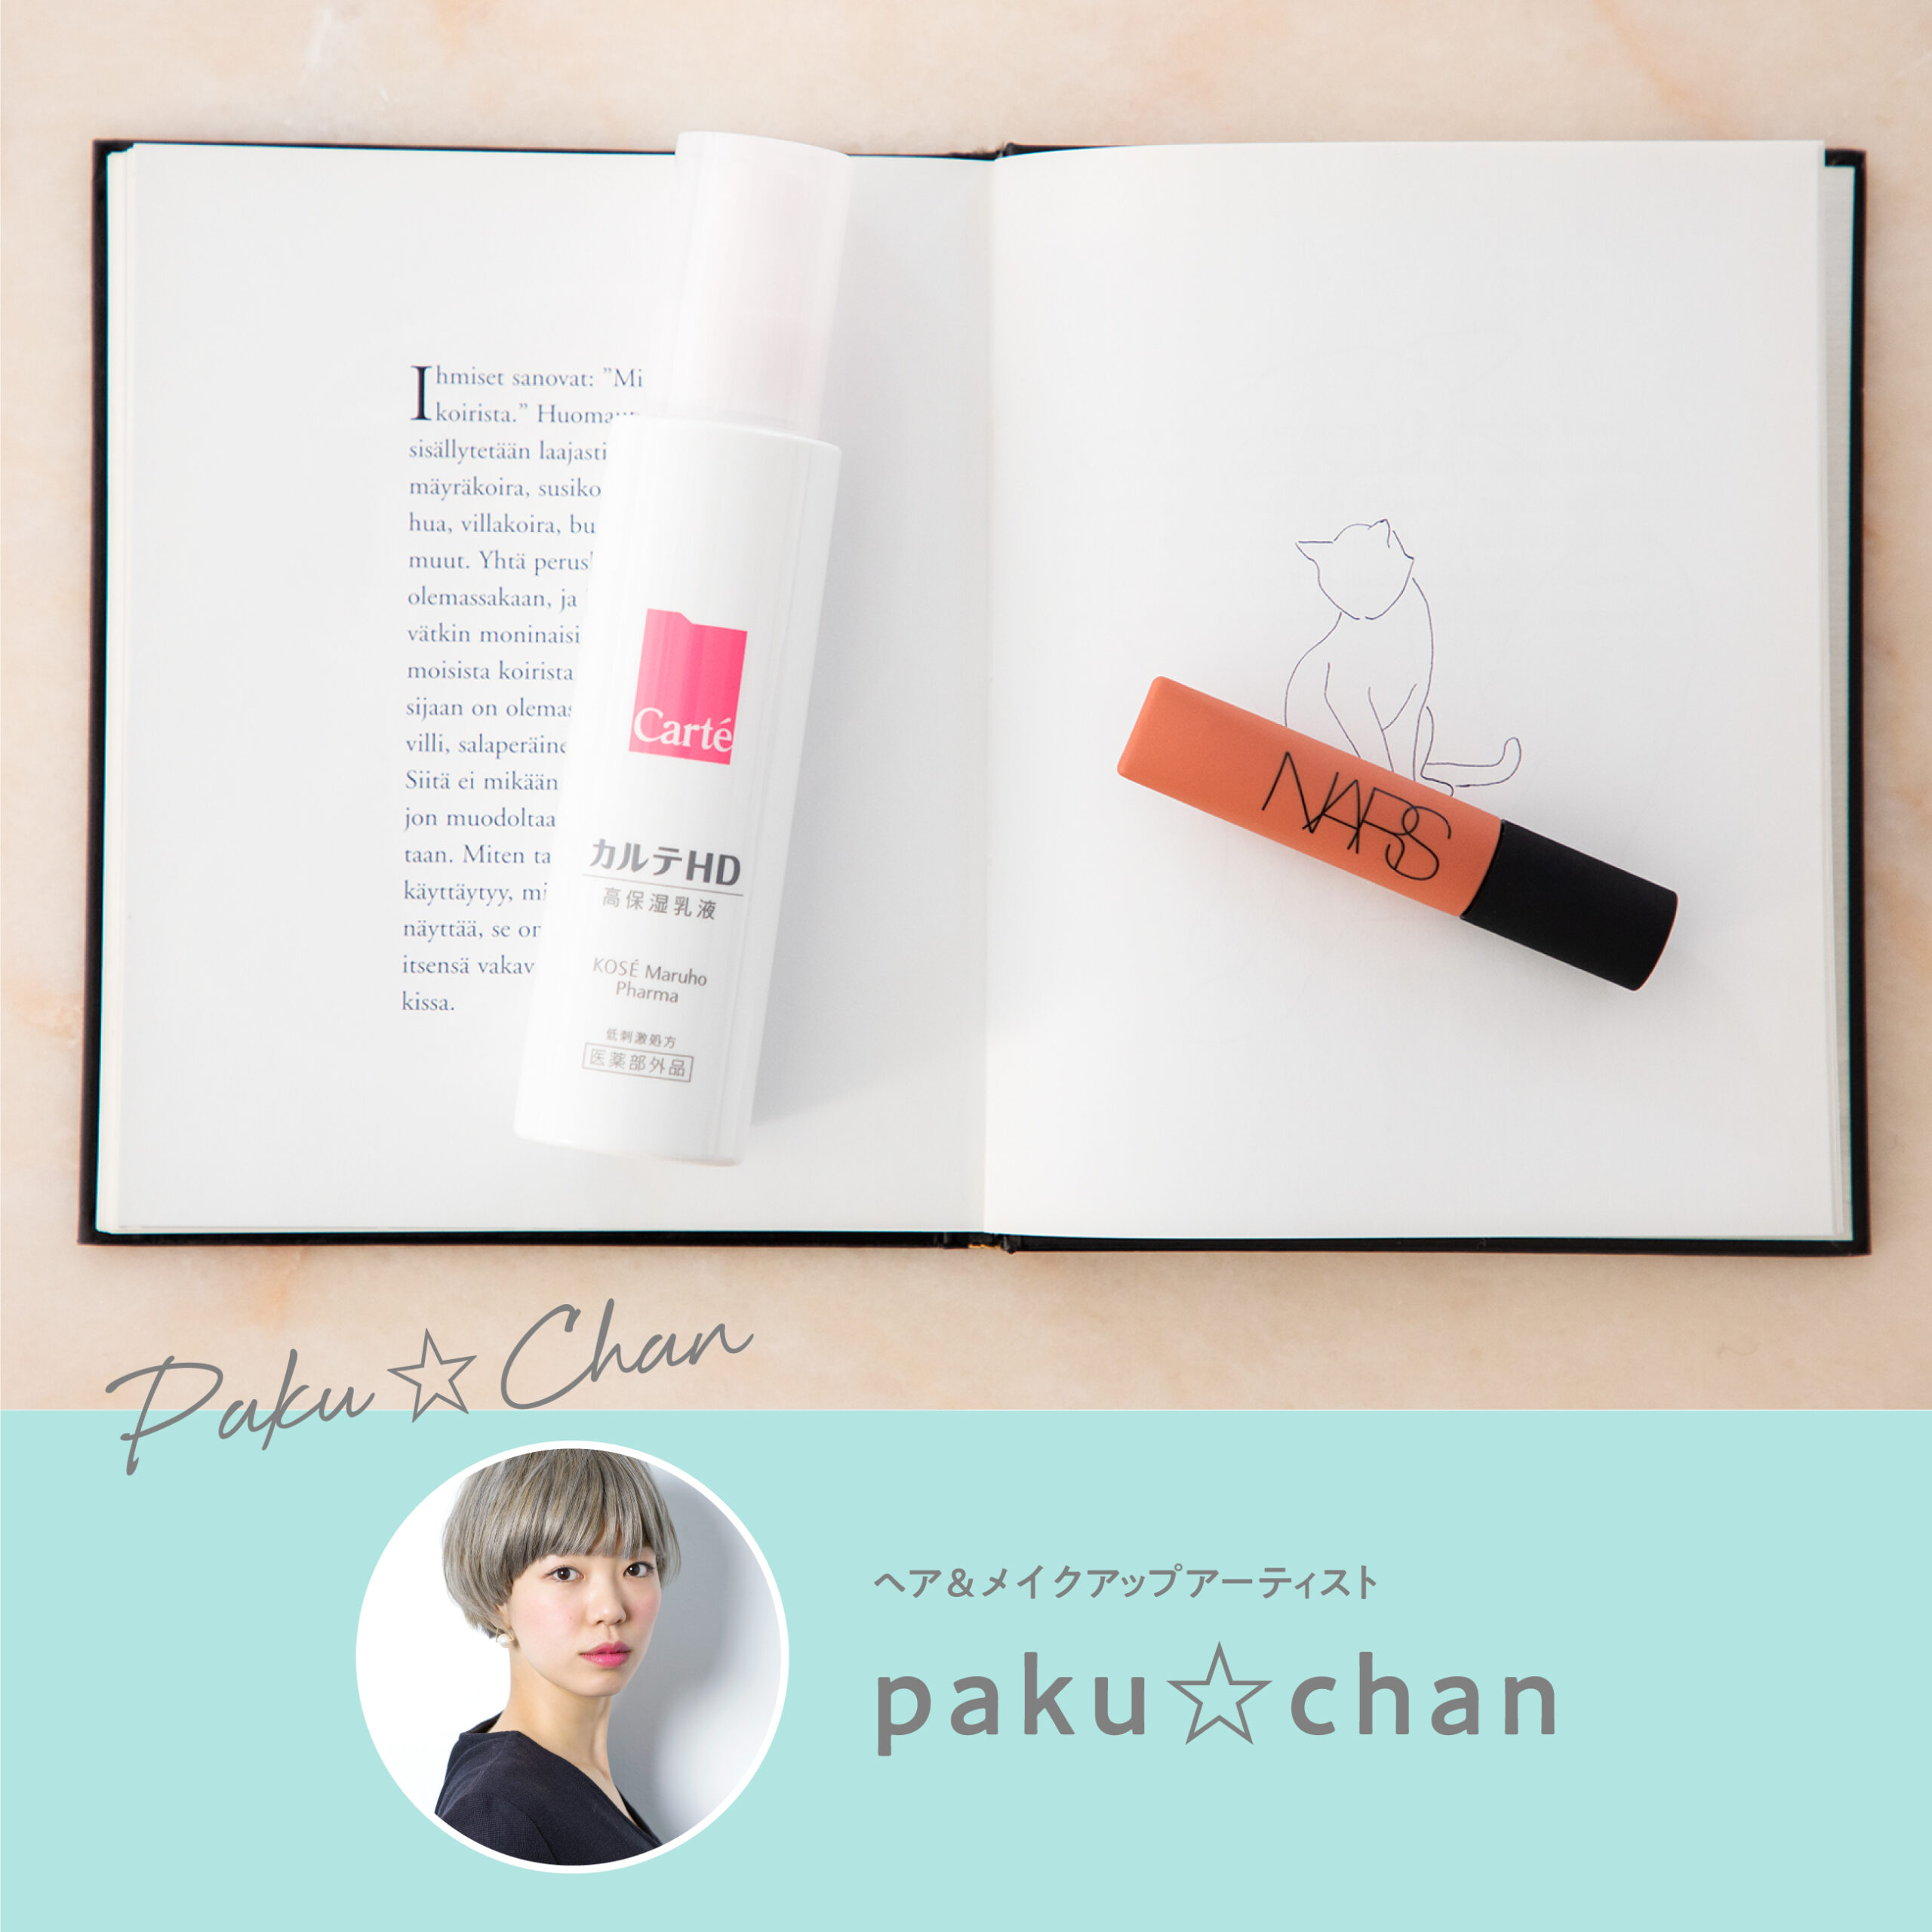 paku☆chanさんが推す#ふぁぼコスメ